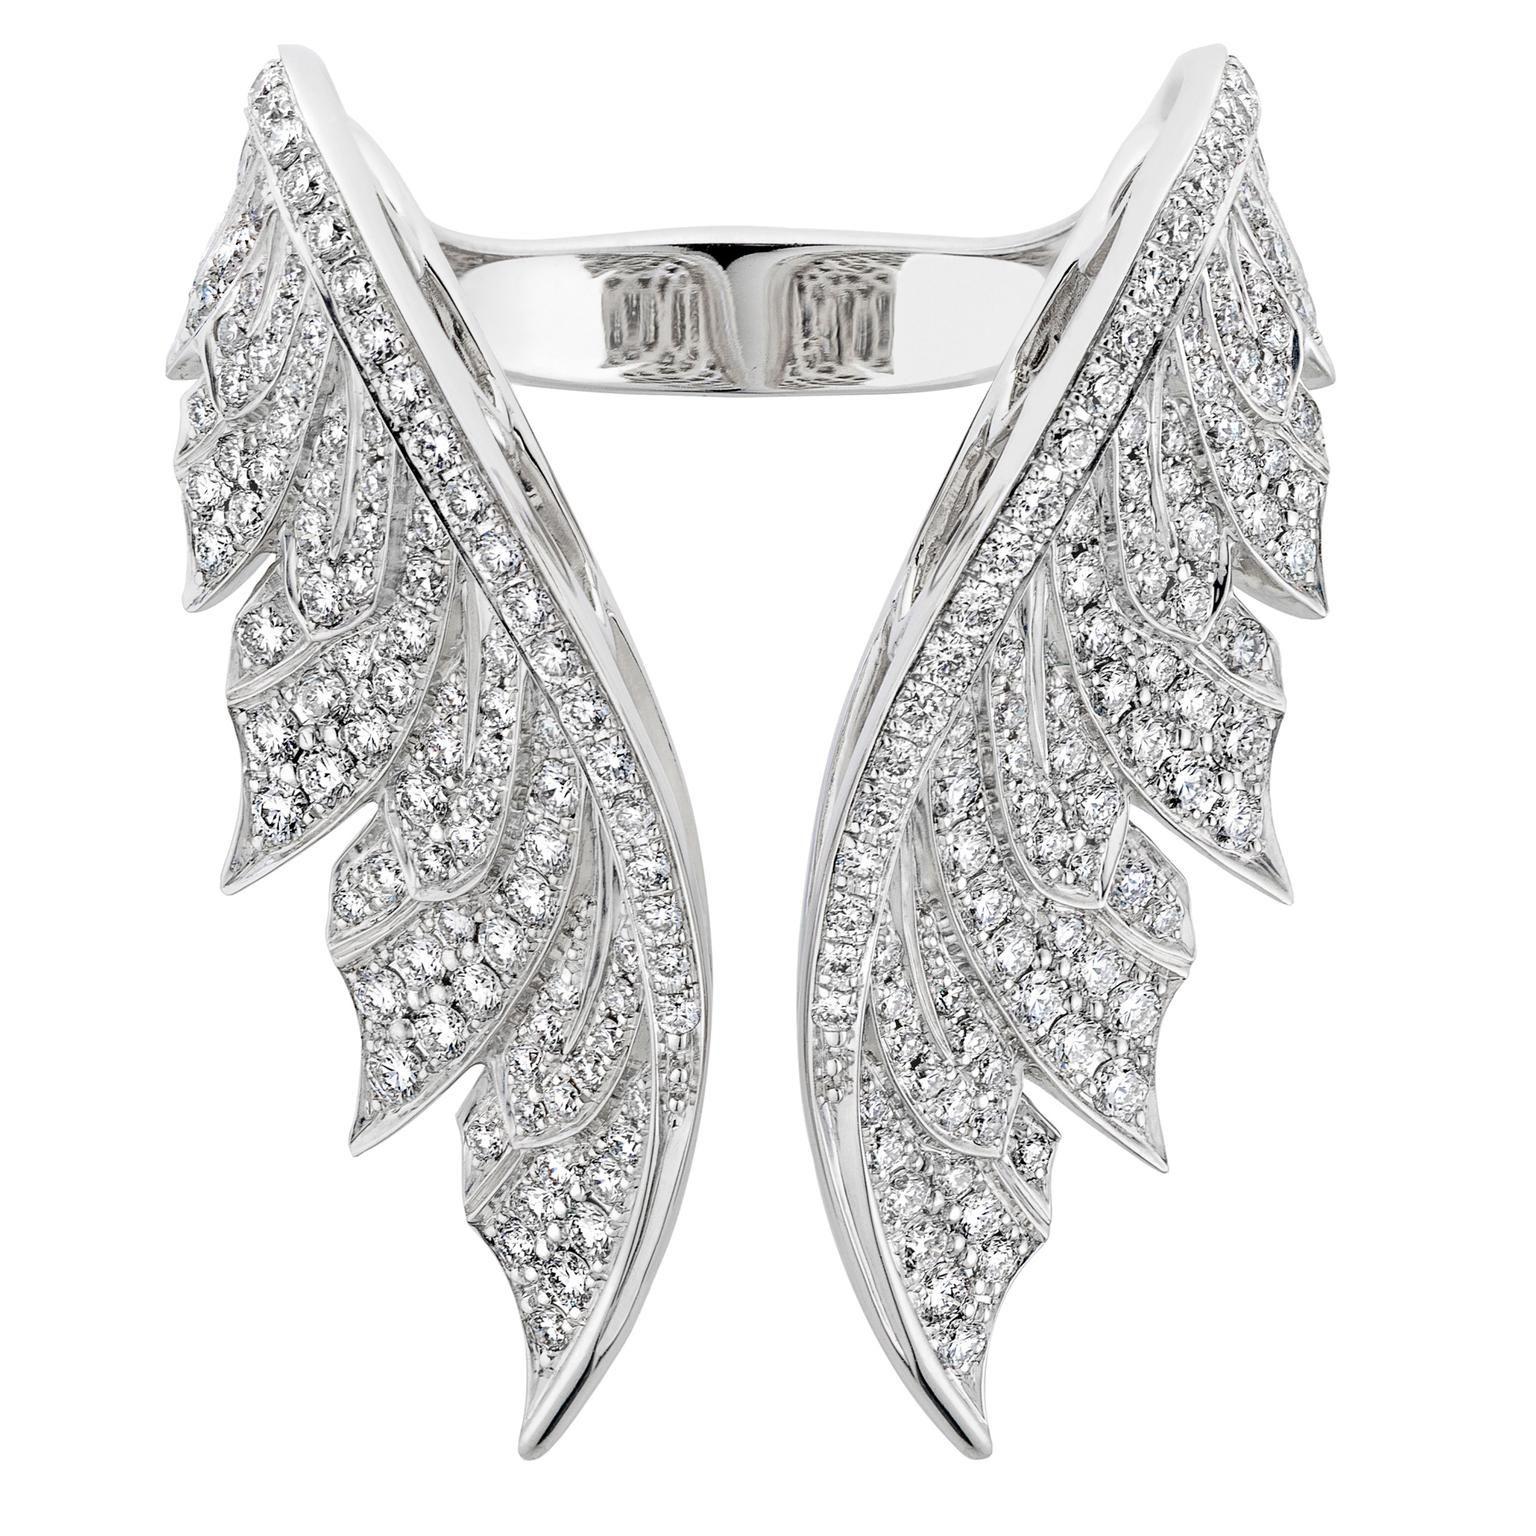 Stephen Webster Magnipheasant diamond ring